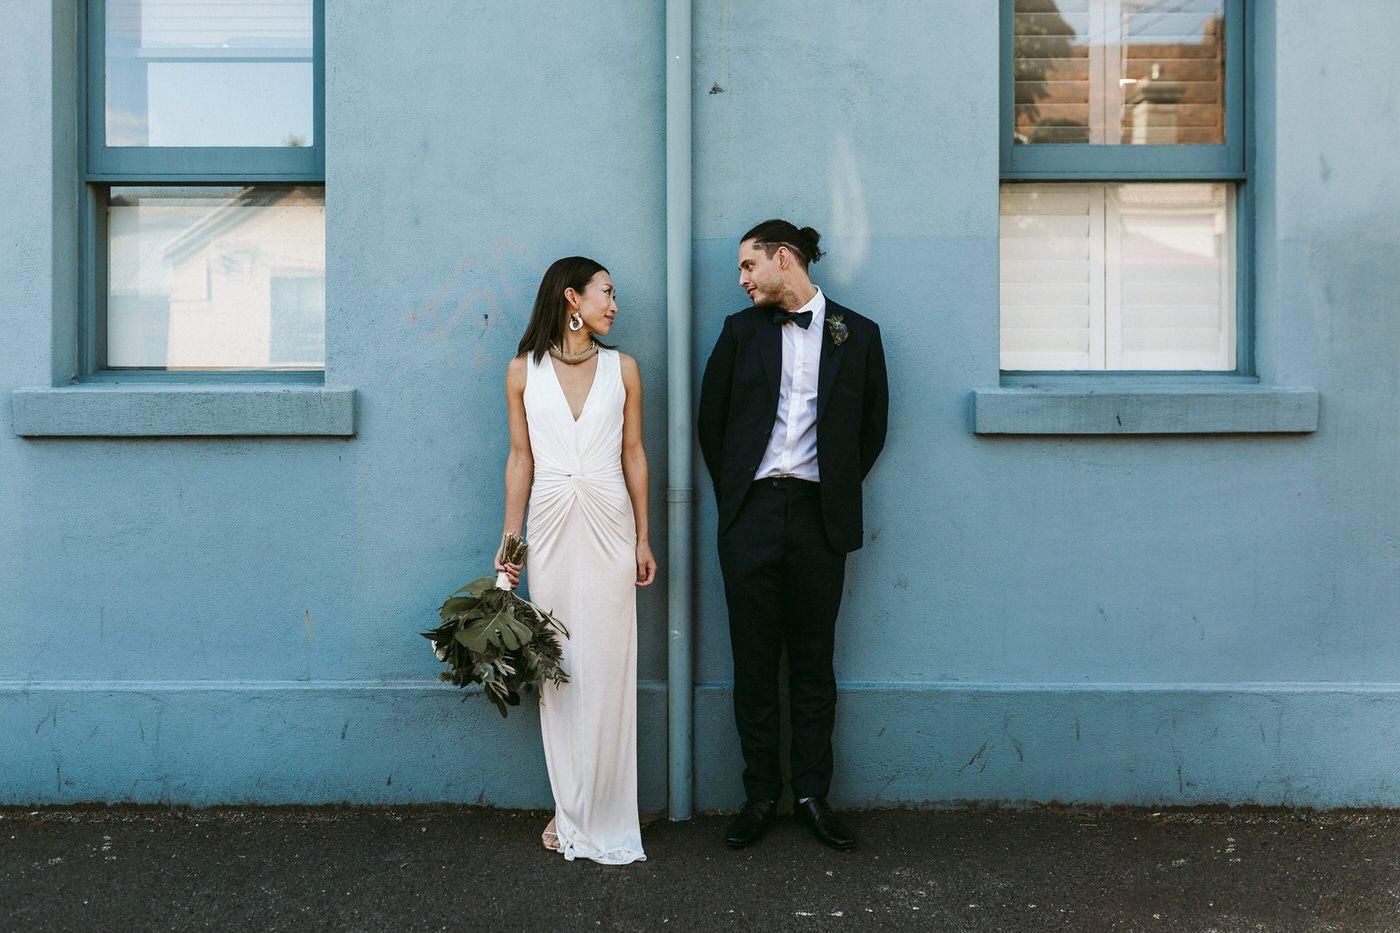 GoldandGrit_KimMatt_Panama-Dining-Room-Fitzroy-Collingwood-Relaxed-Fun-Candid-Wedding-Photography_59.jpg